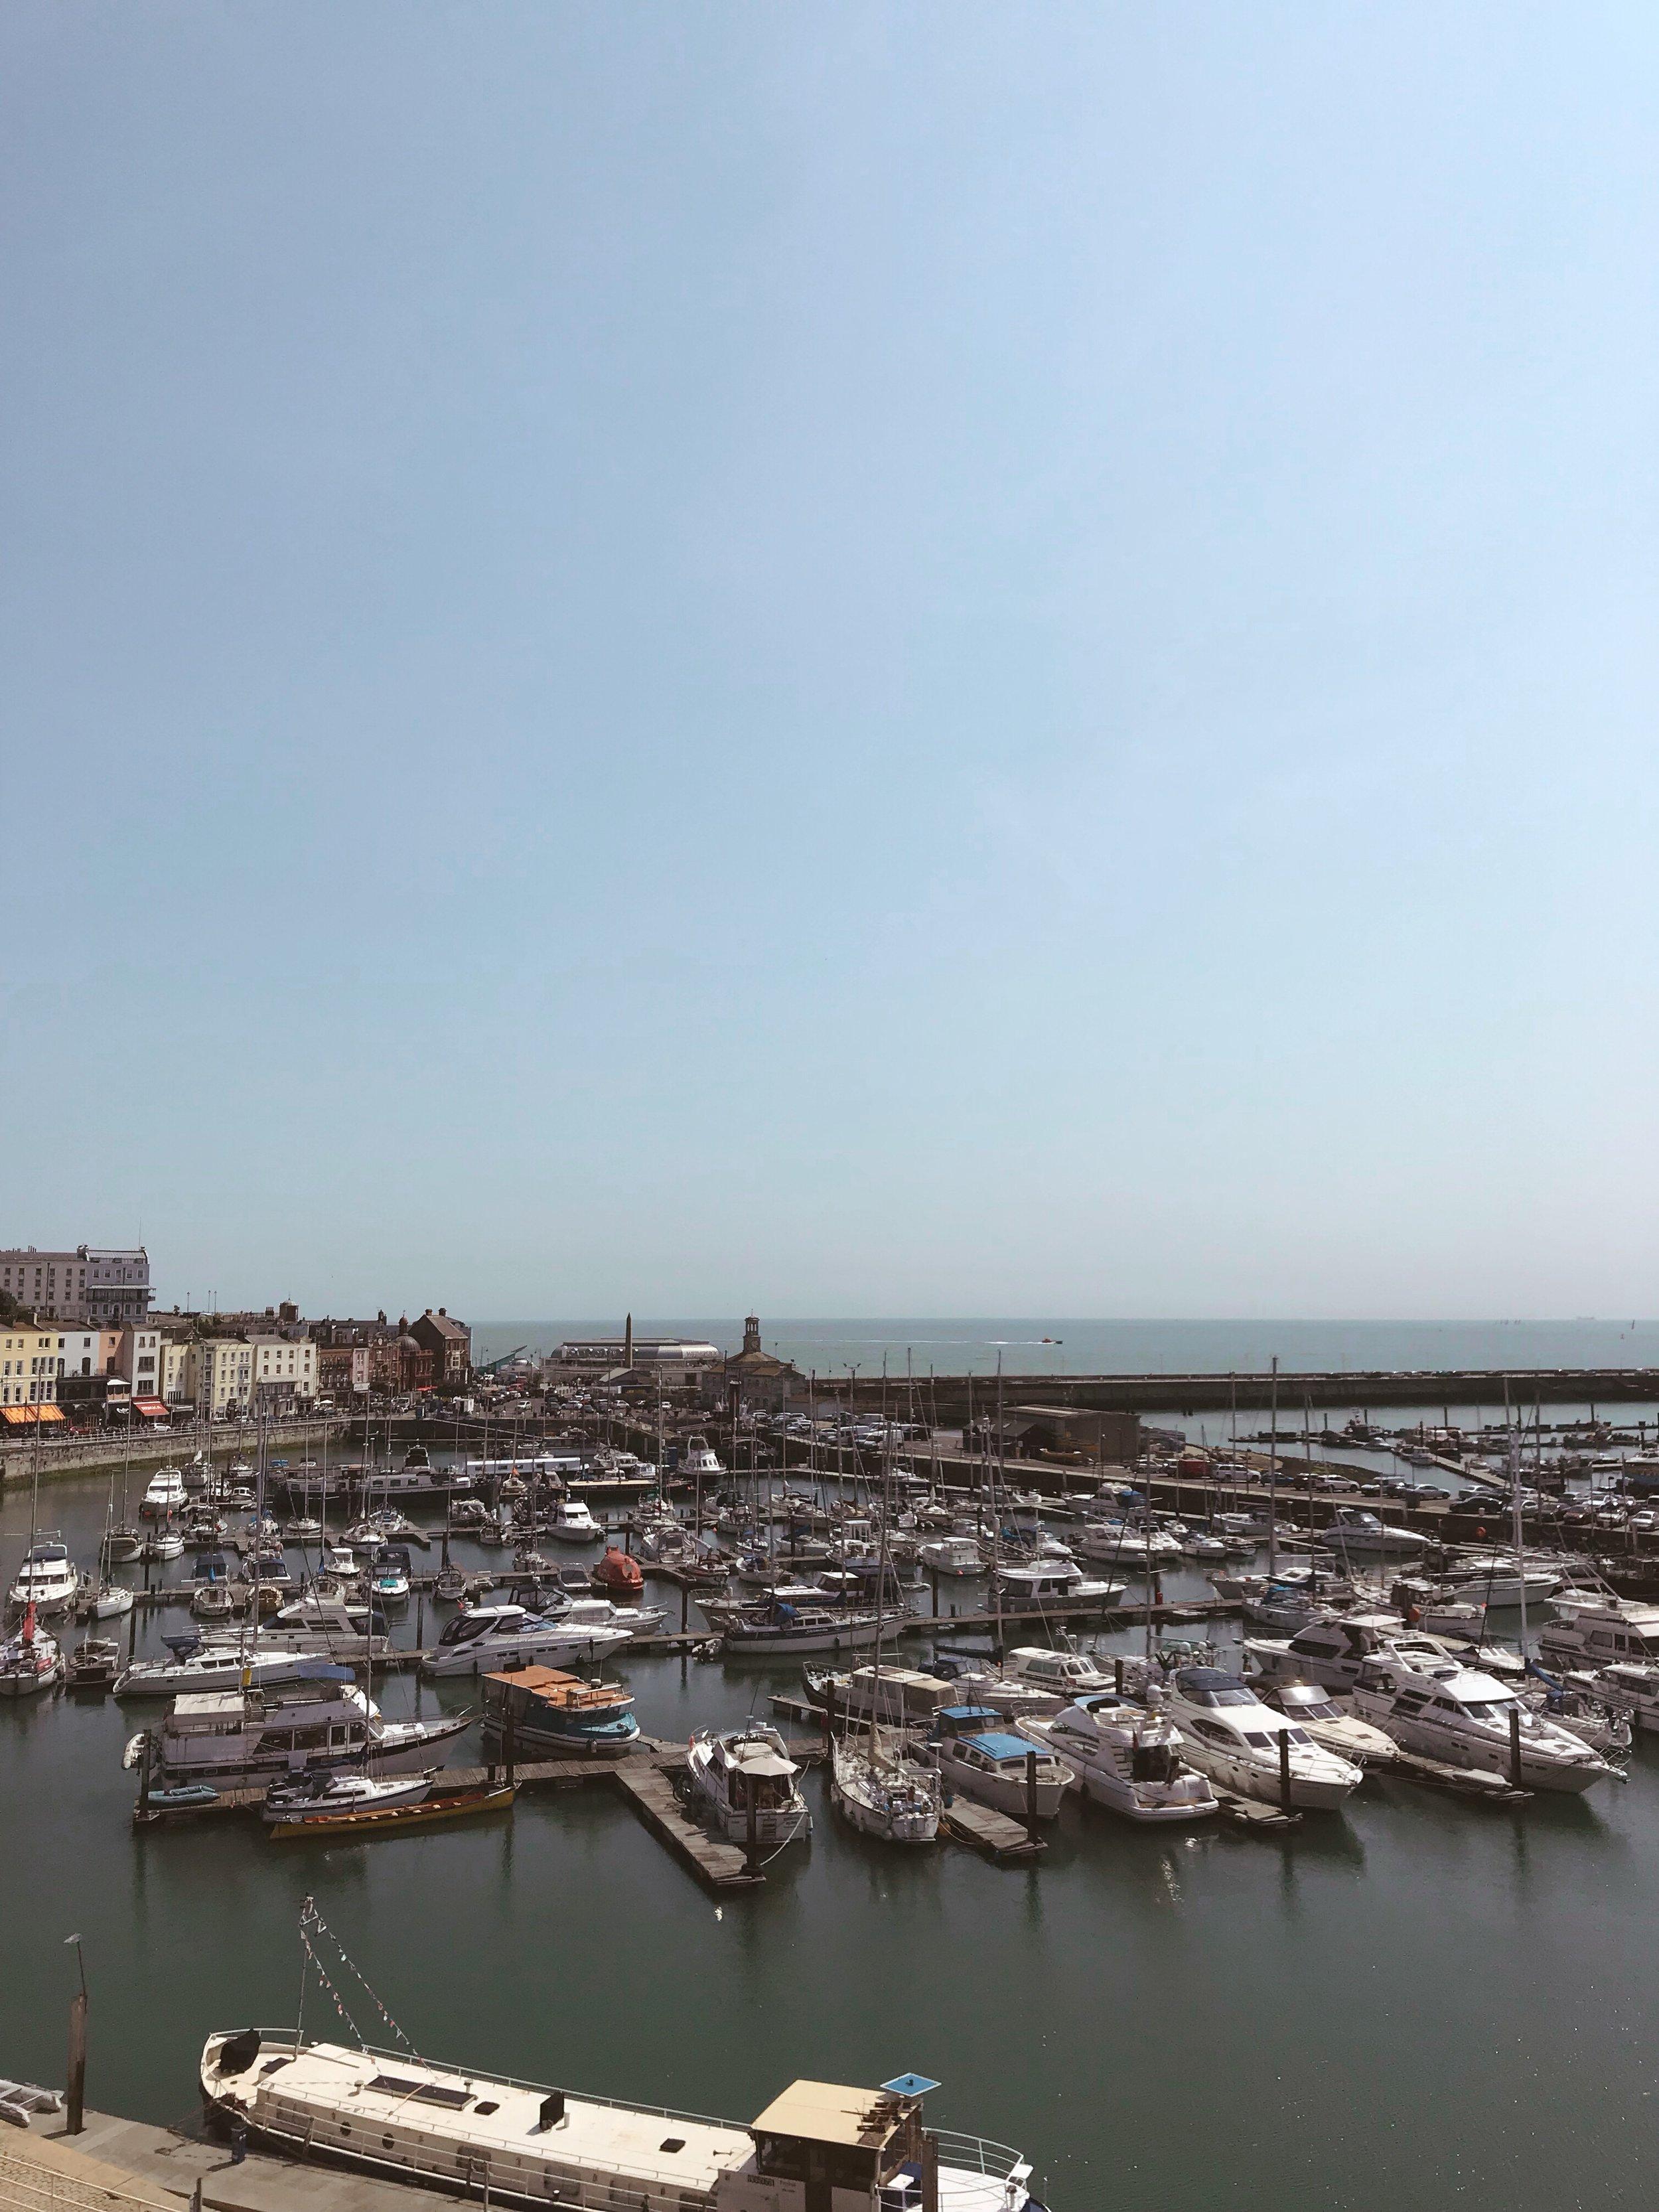 Royal Ramsgate Marina - Royal Harbour Marina,Military RoadRamsgate CT11 9LQ